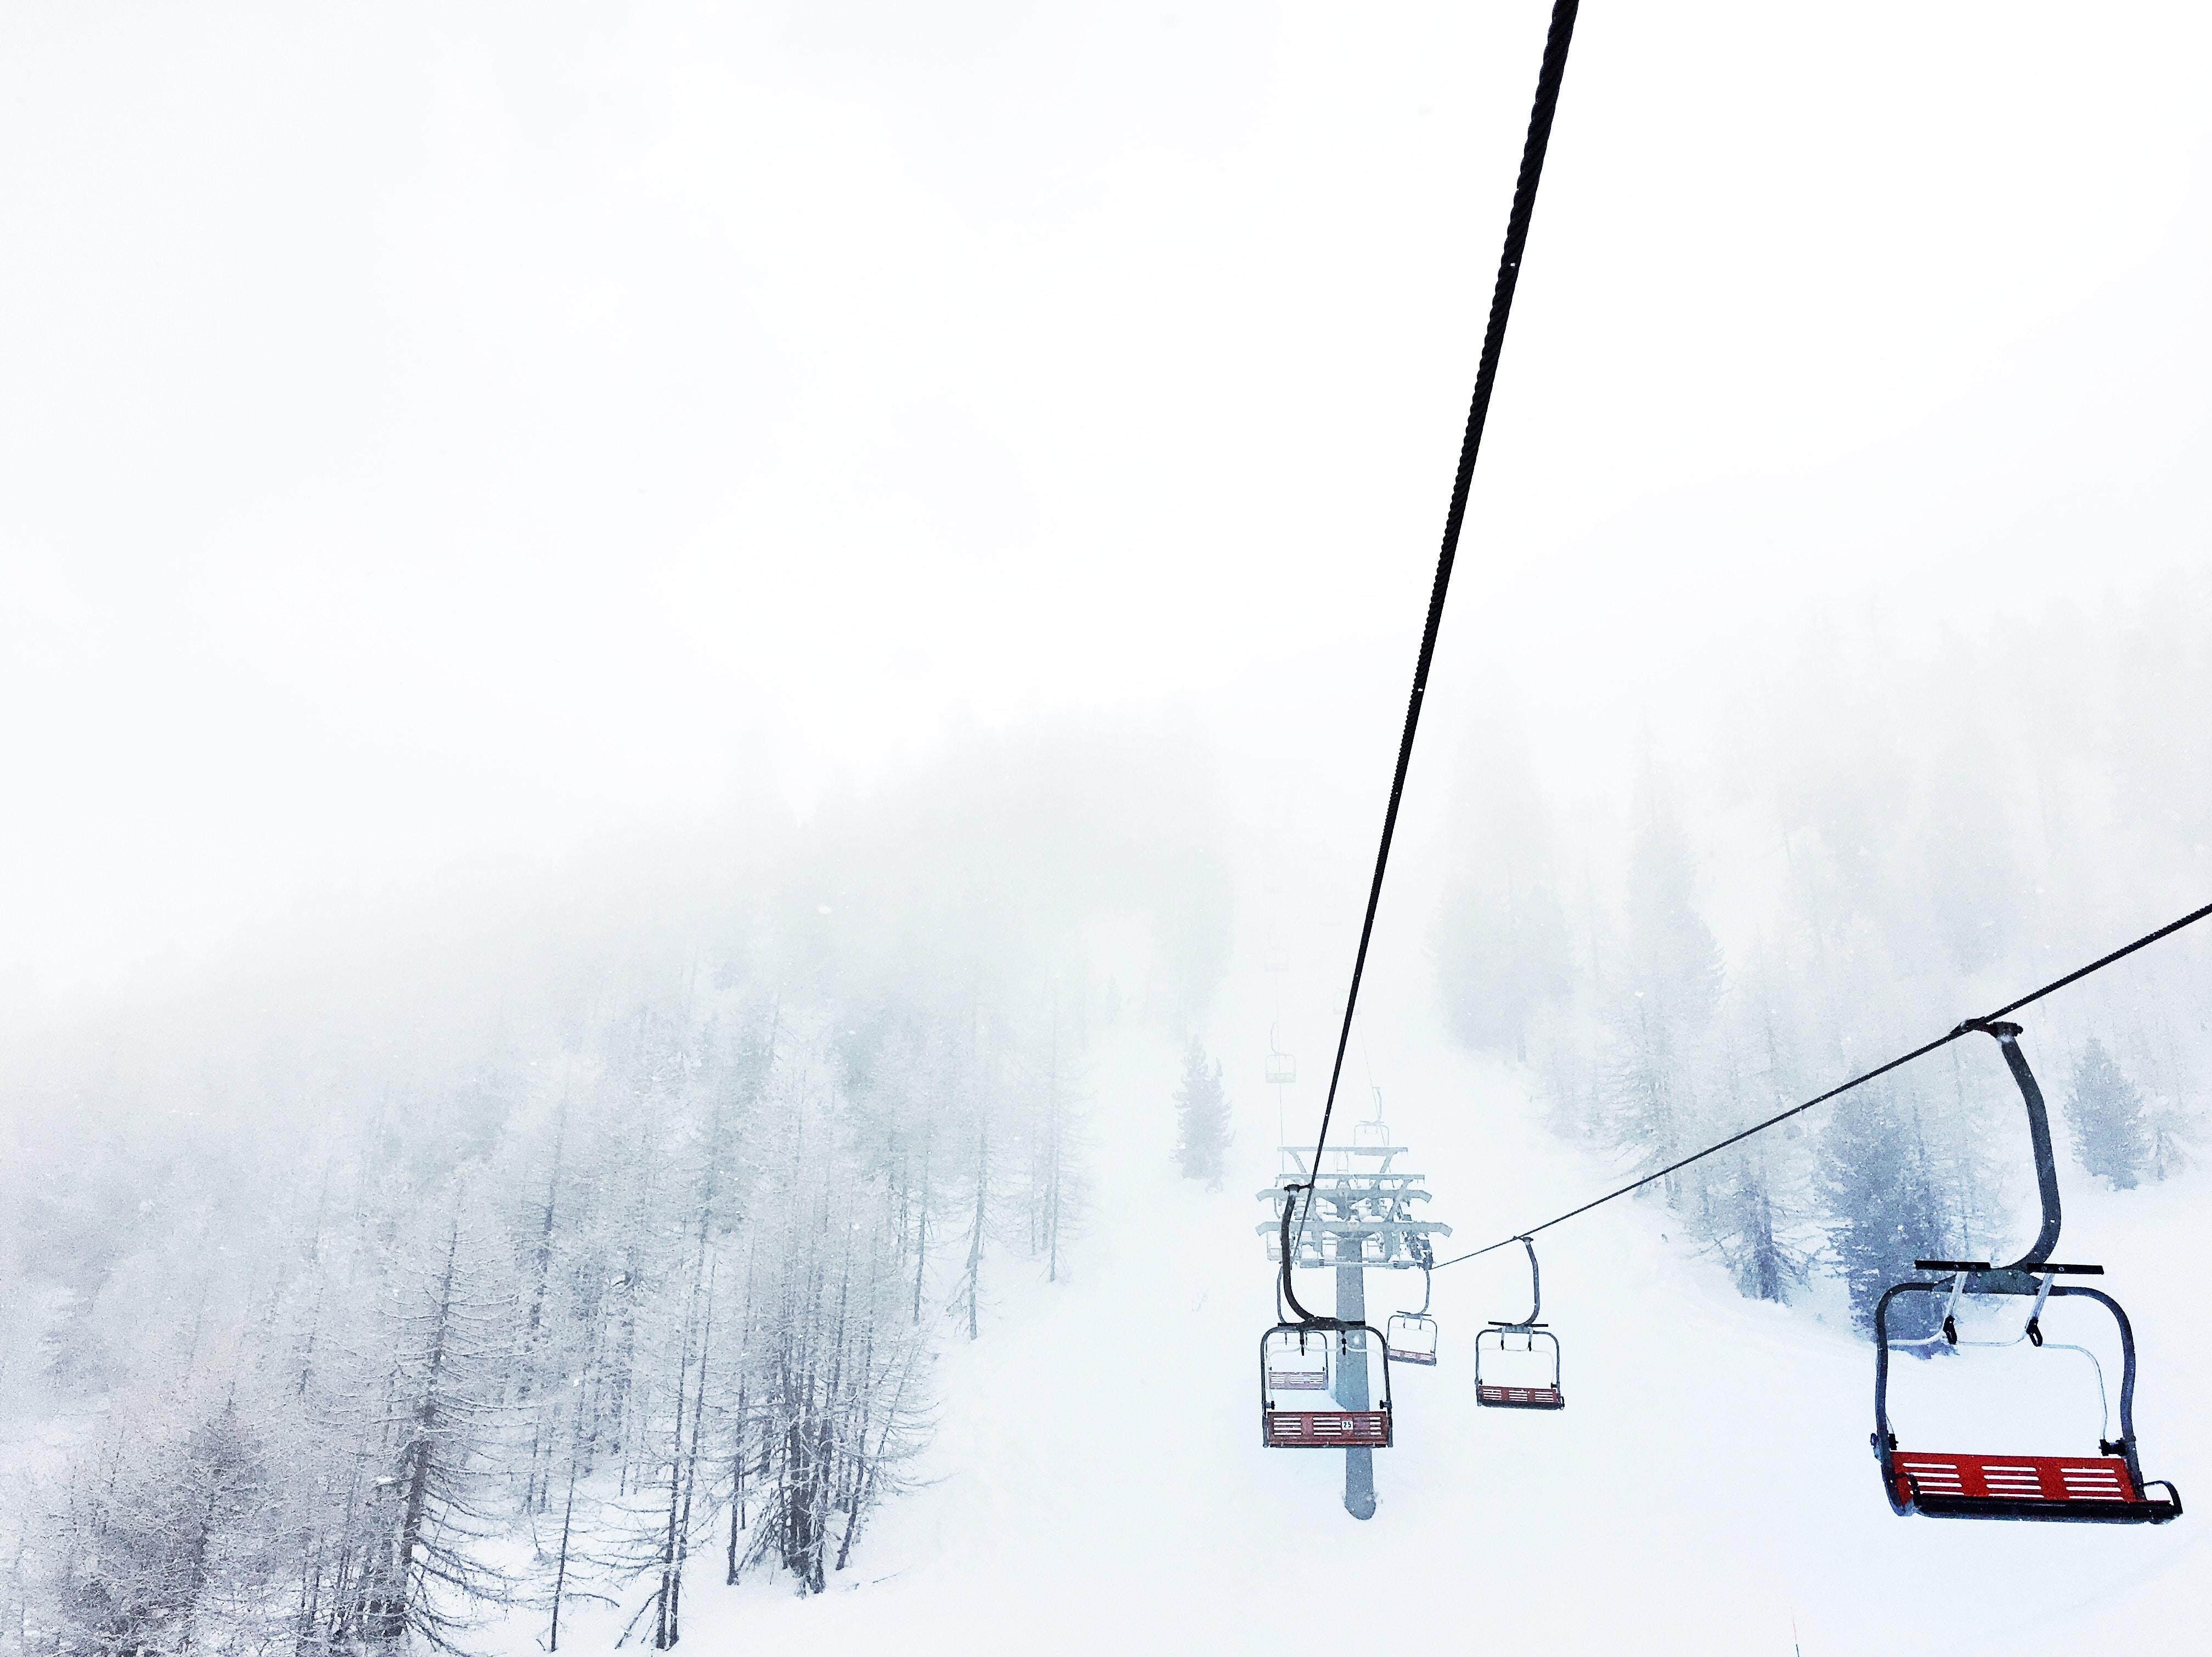 black and red ski lift near trees